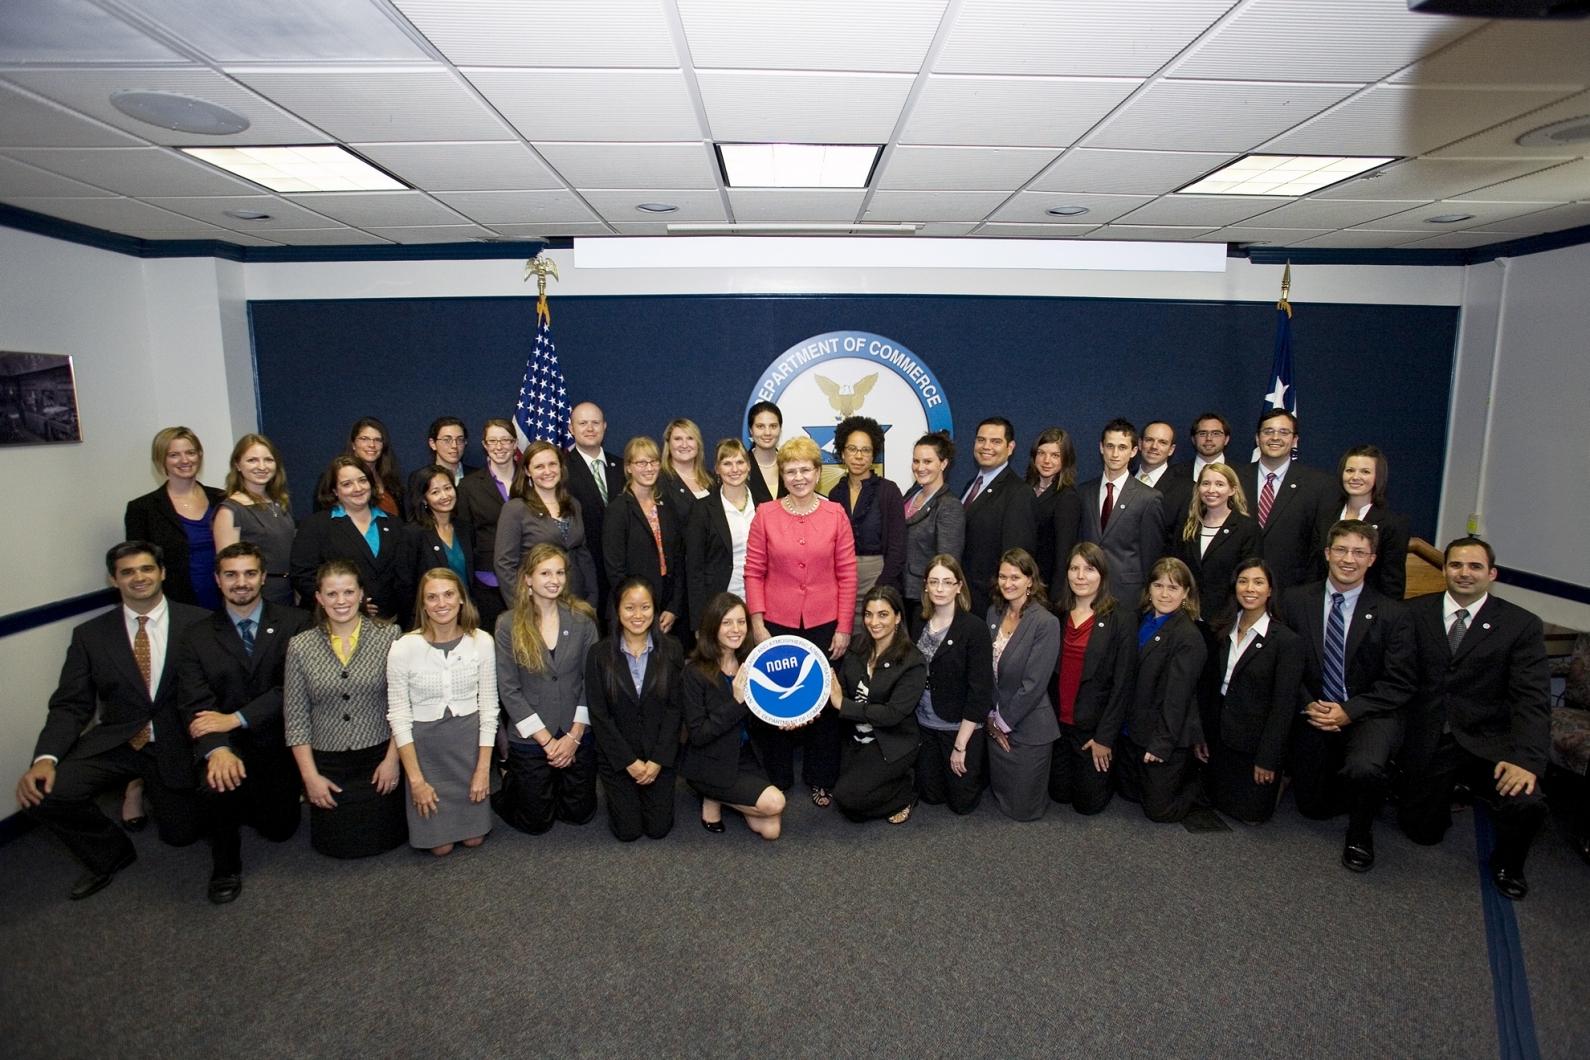 A former class of Knauss fellows pose for a photo during their one-year fellowship in Washington, D.C.